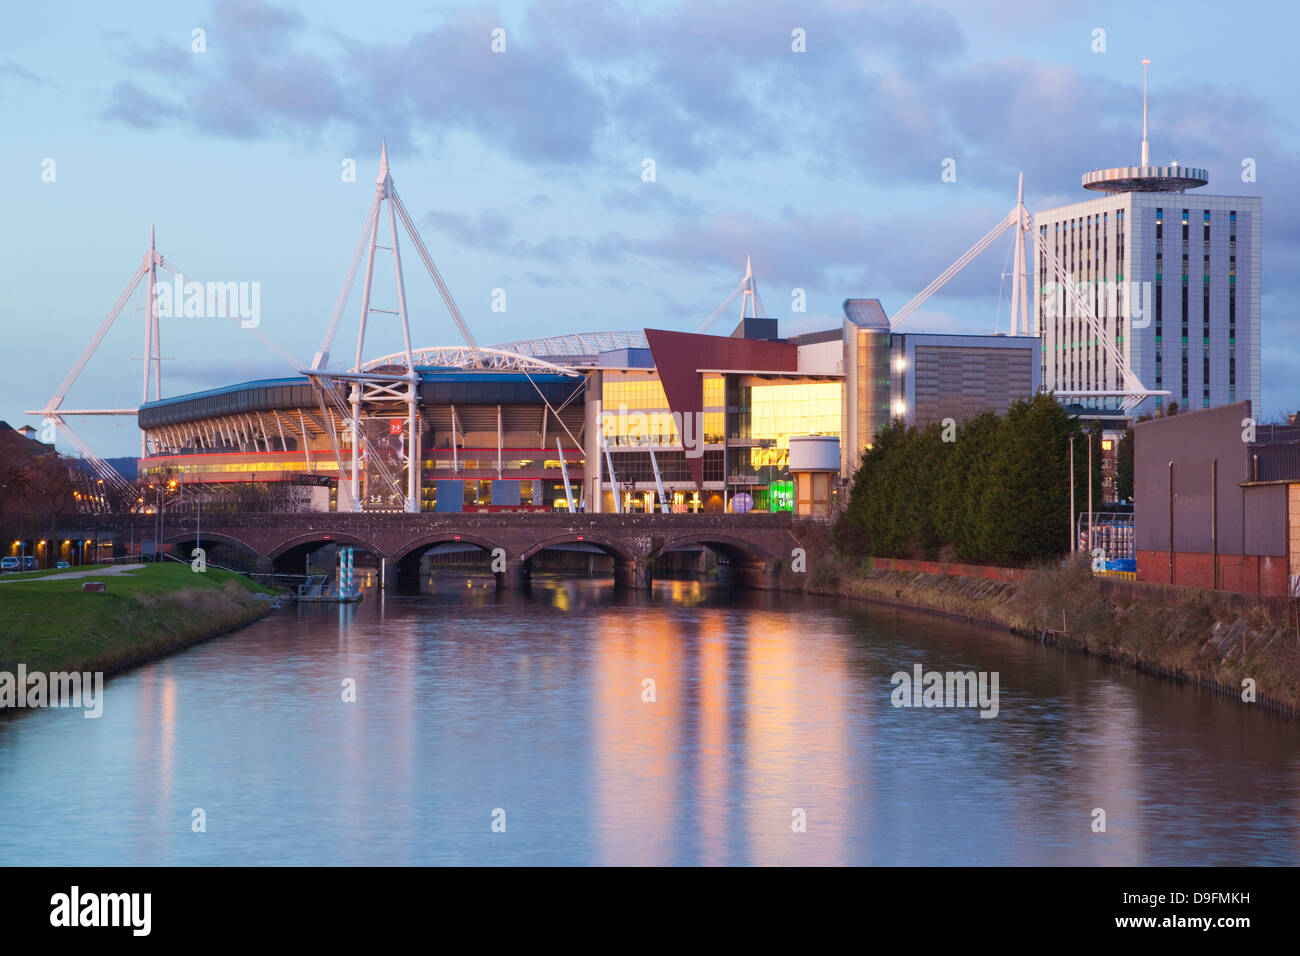 Millennium Stadium, Cardiff, Wales, UK - Stock Image